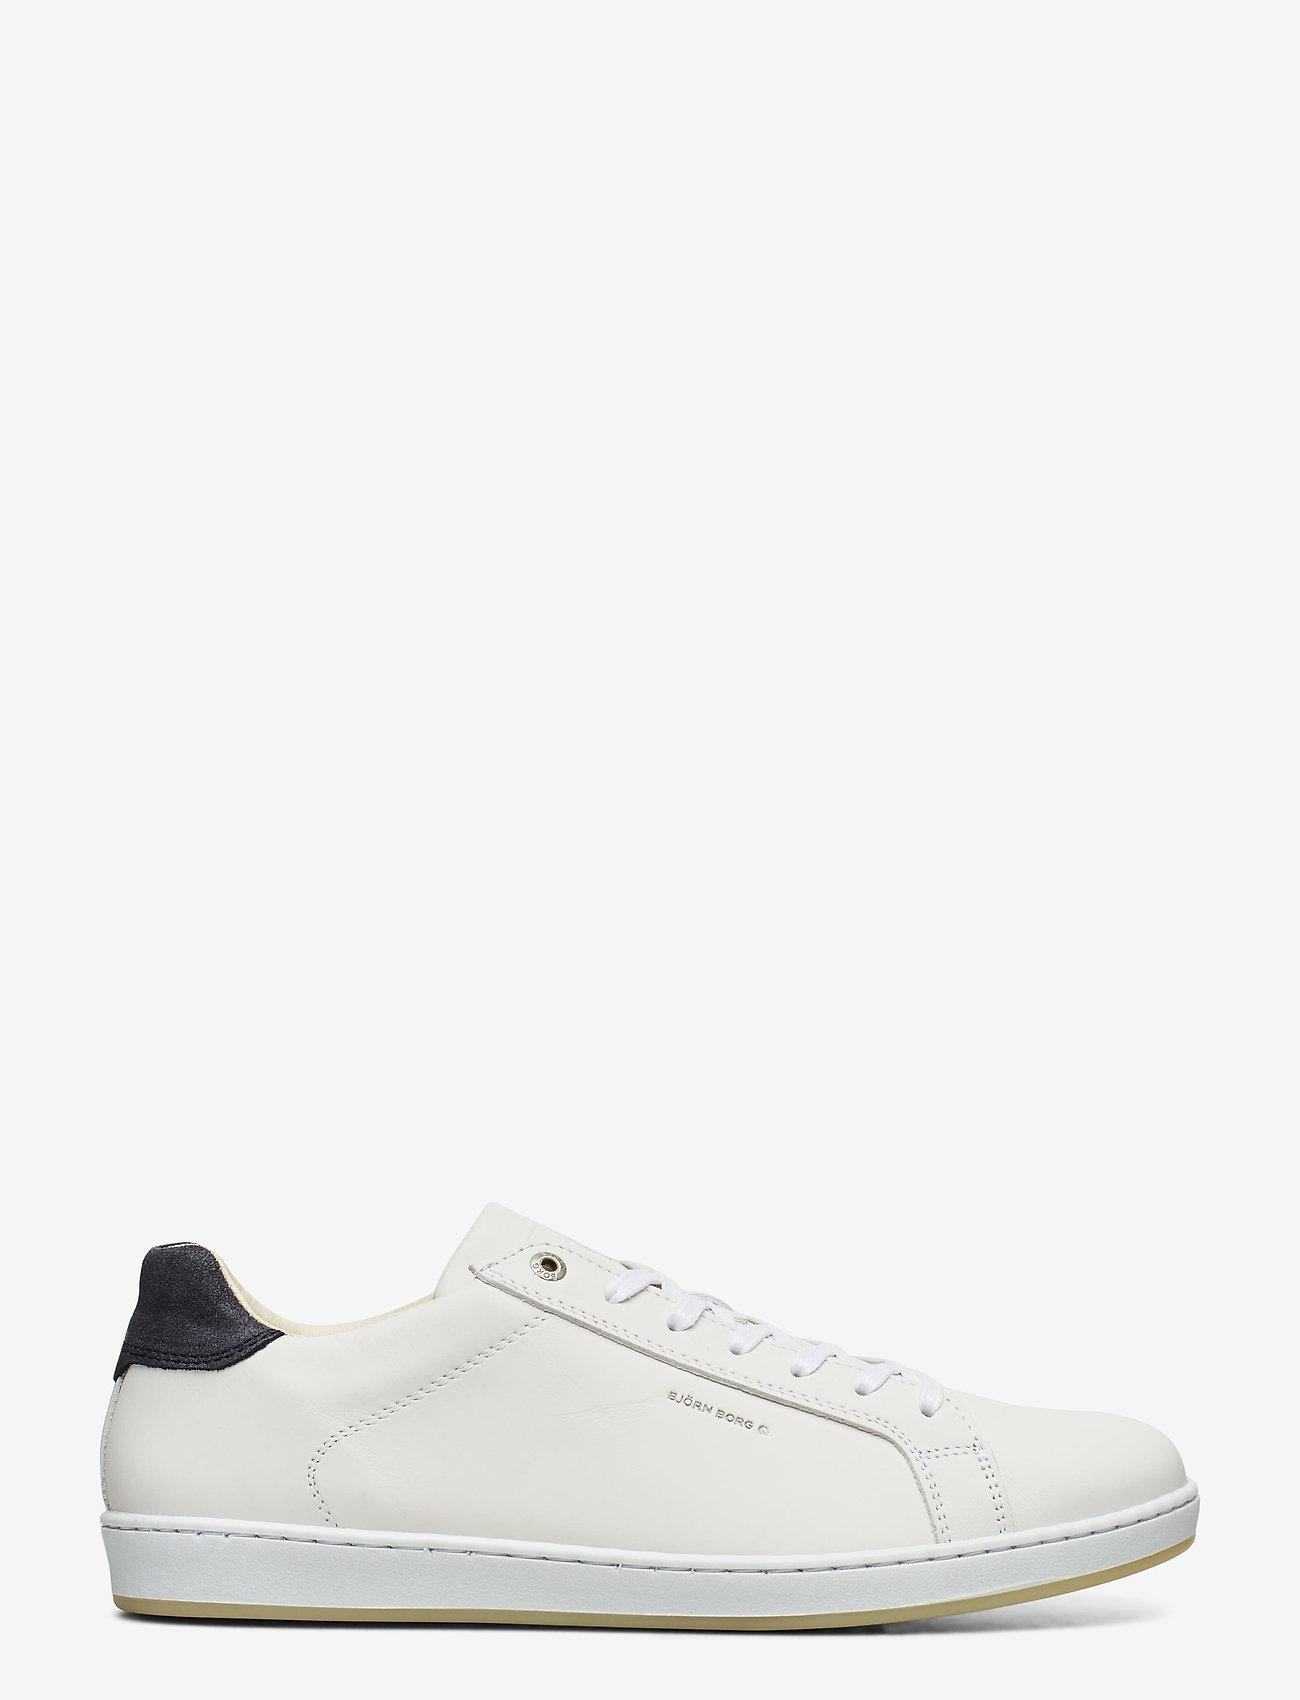 Björn Borg - TOBIE BSC M - laag sneakers - white - 1